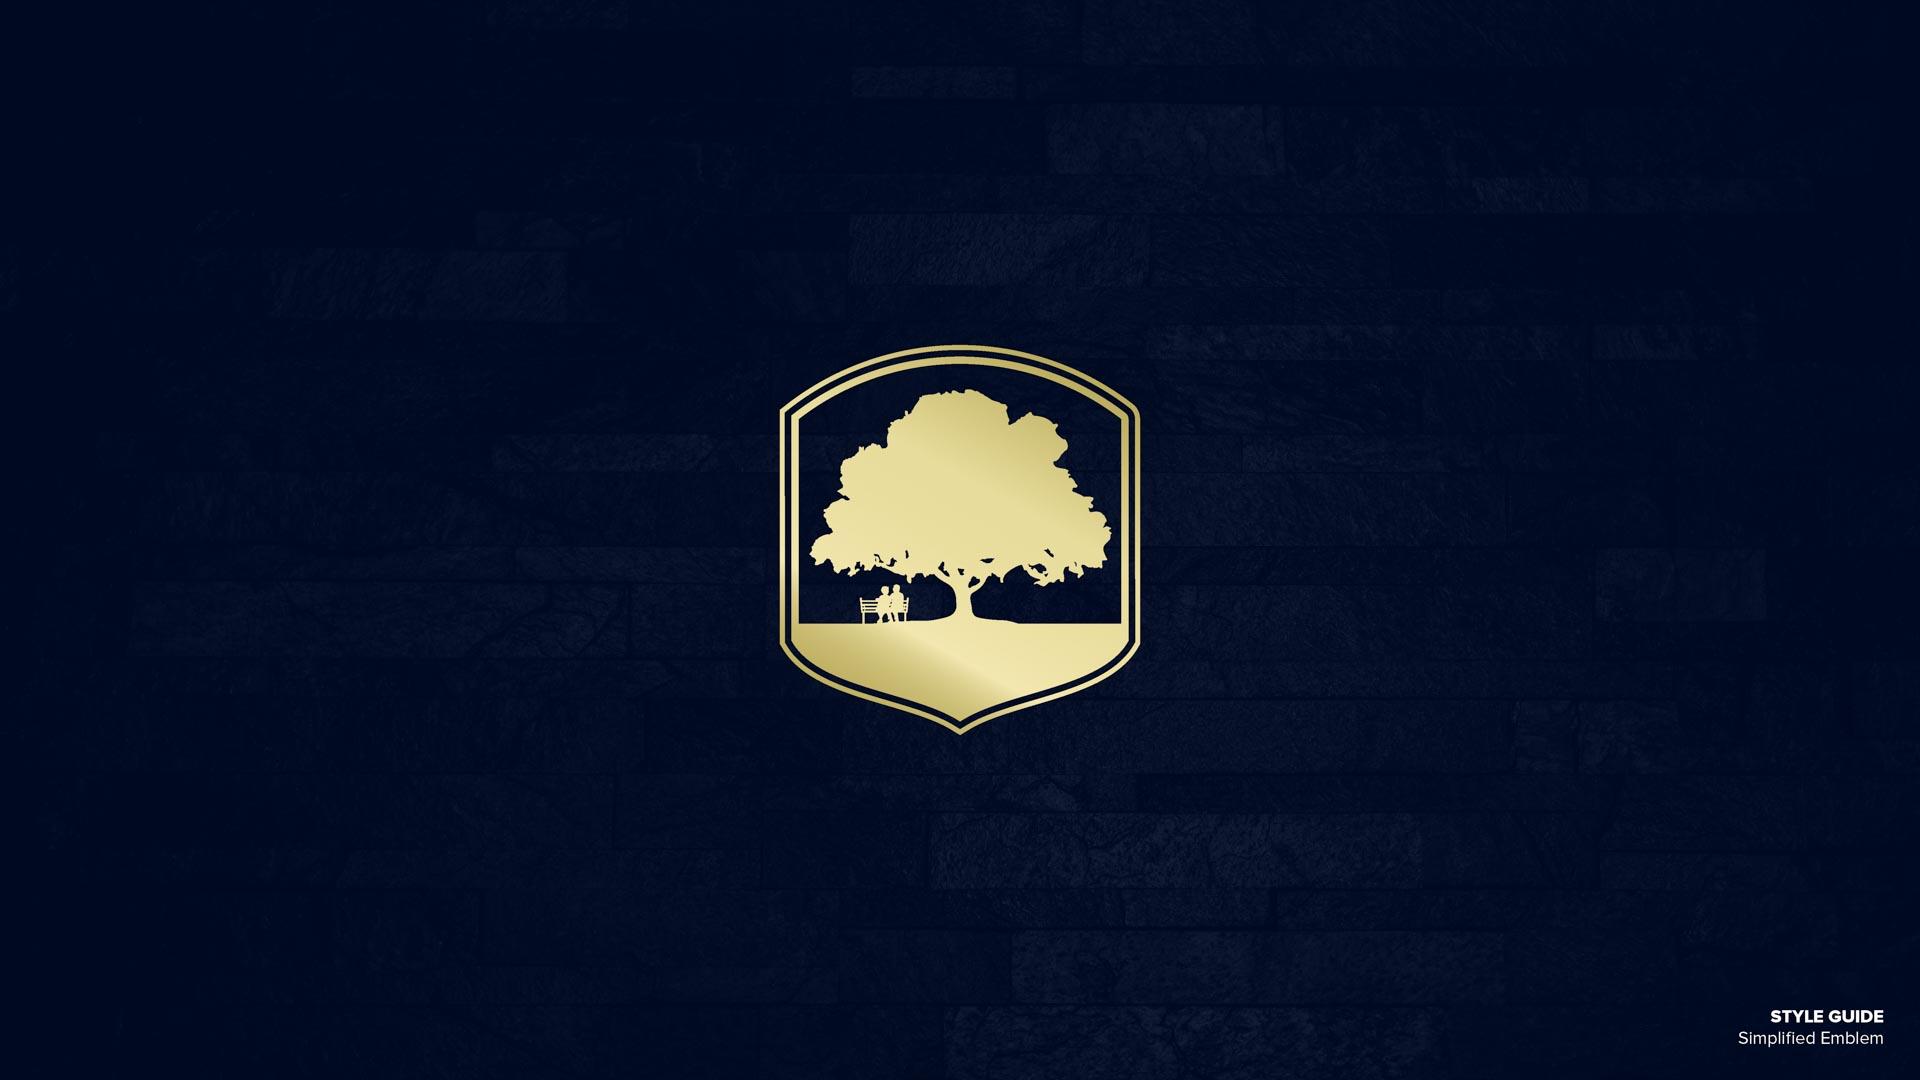 Holy Cross Village's Simplified Emblem